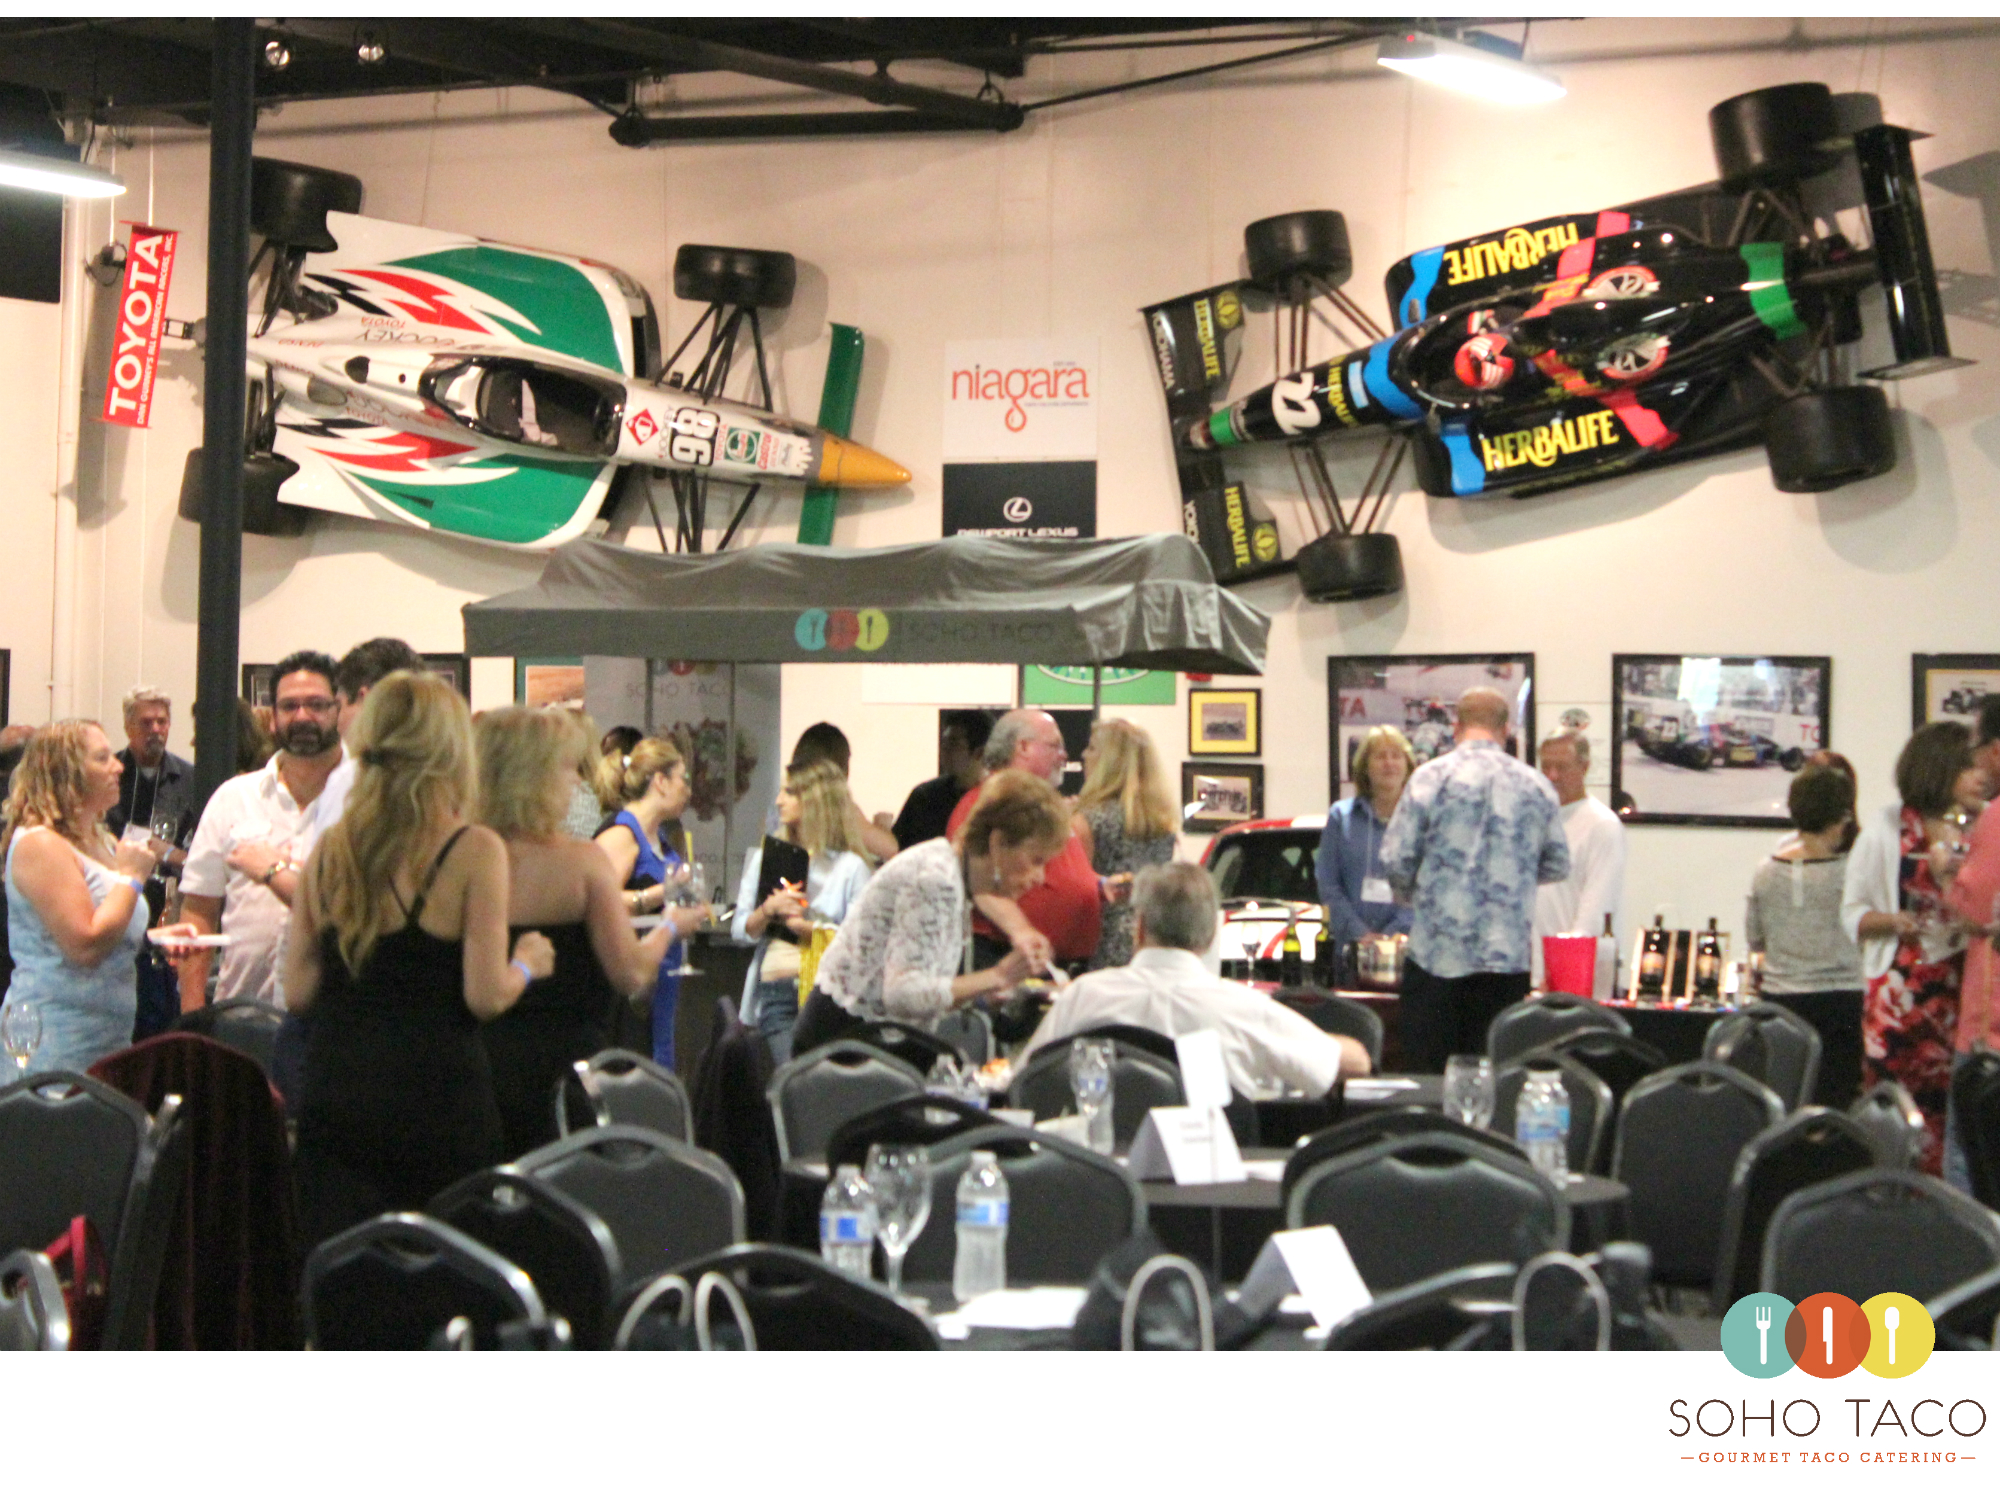 SOHO TACO Gourmet Taco Catering - Marconi Museum - Tustin - Orange County - OC